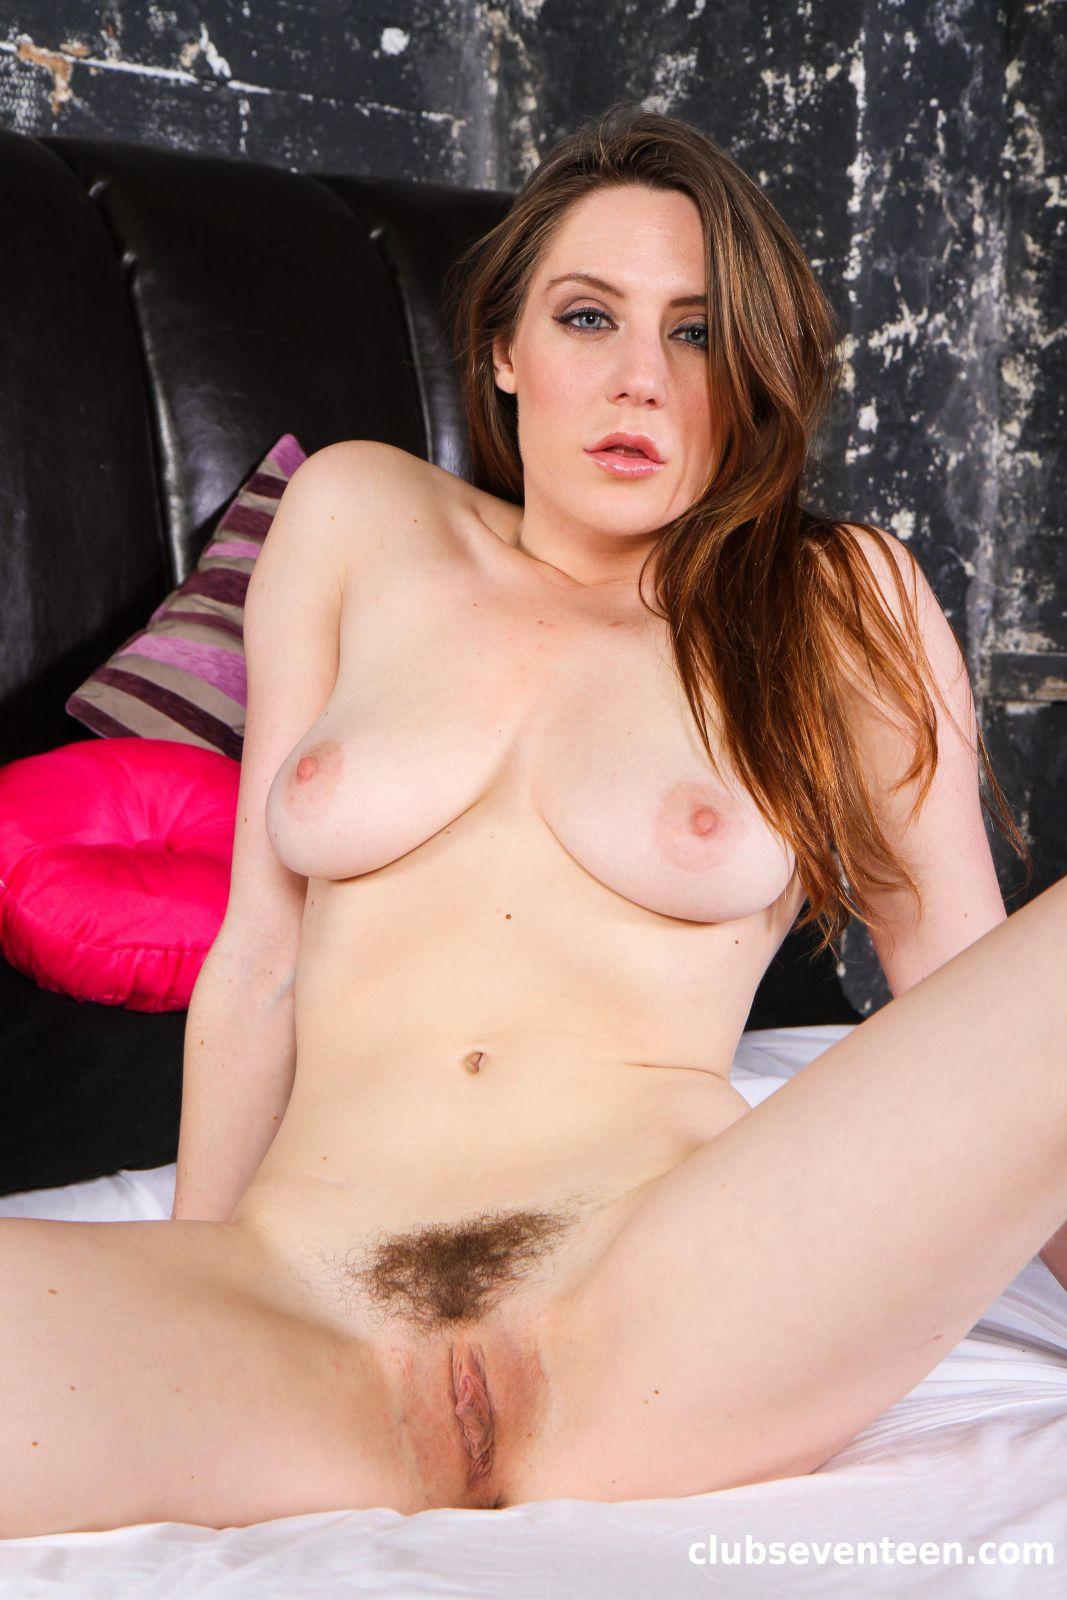 Nude samantha bentley Samantha Bentley